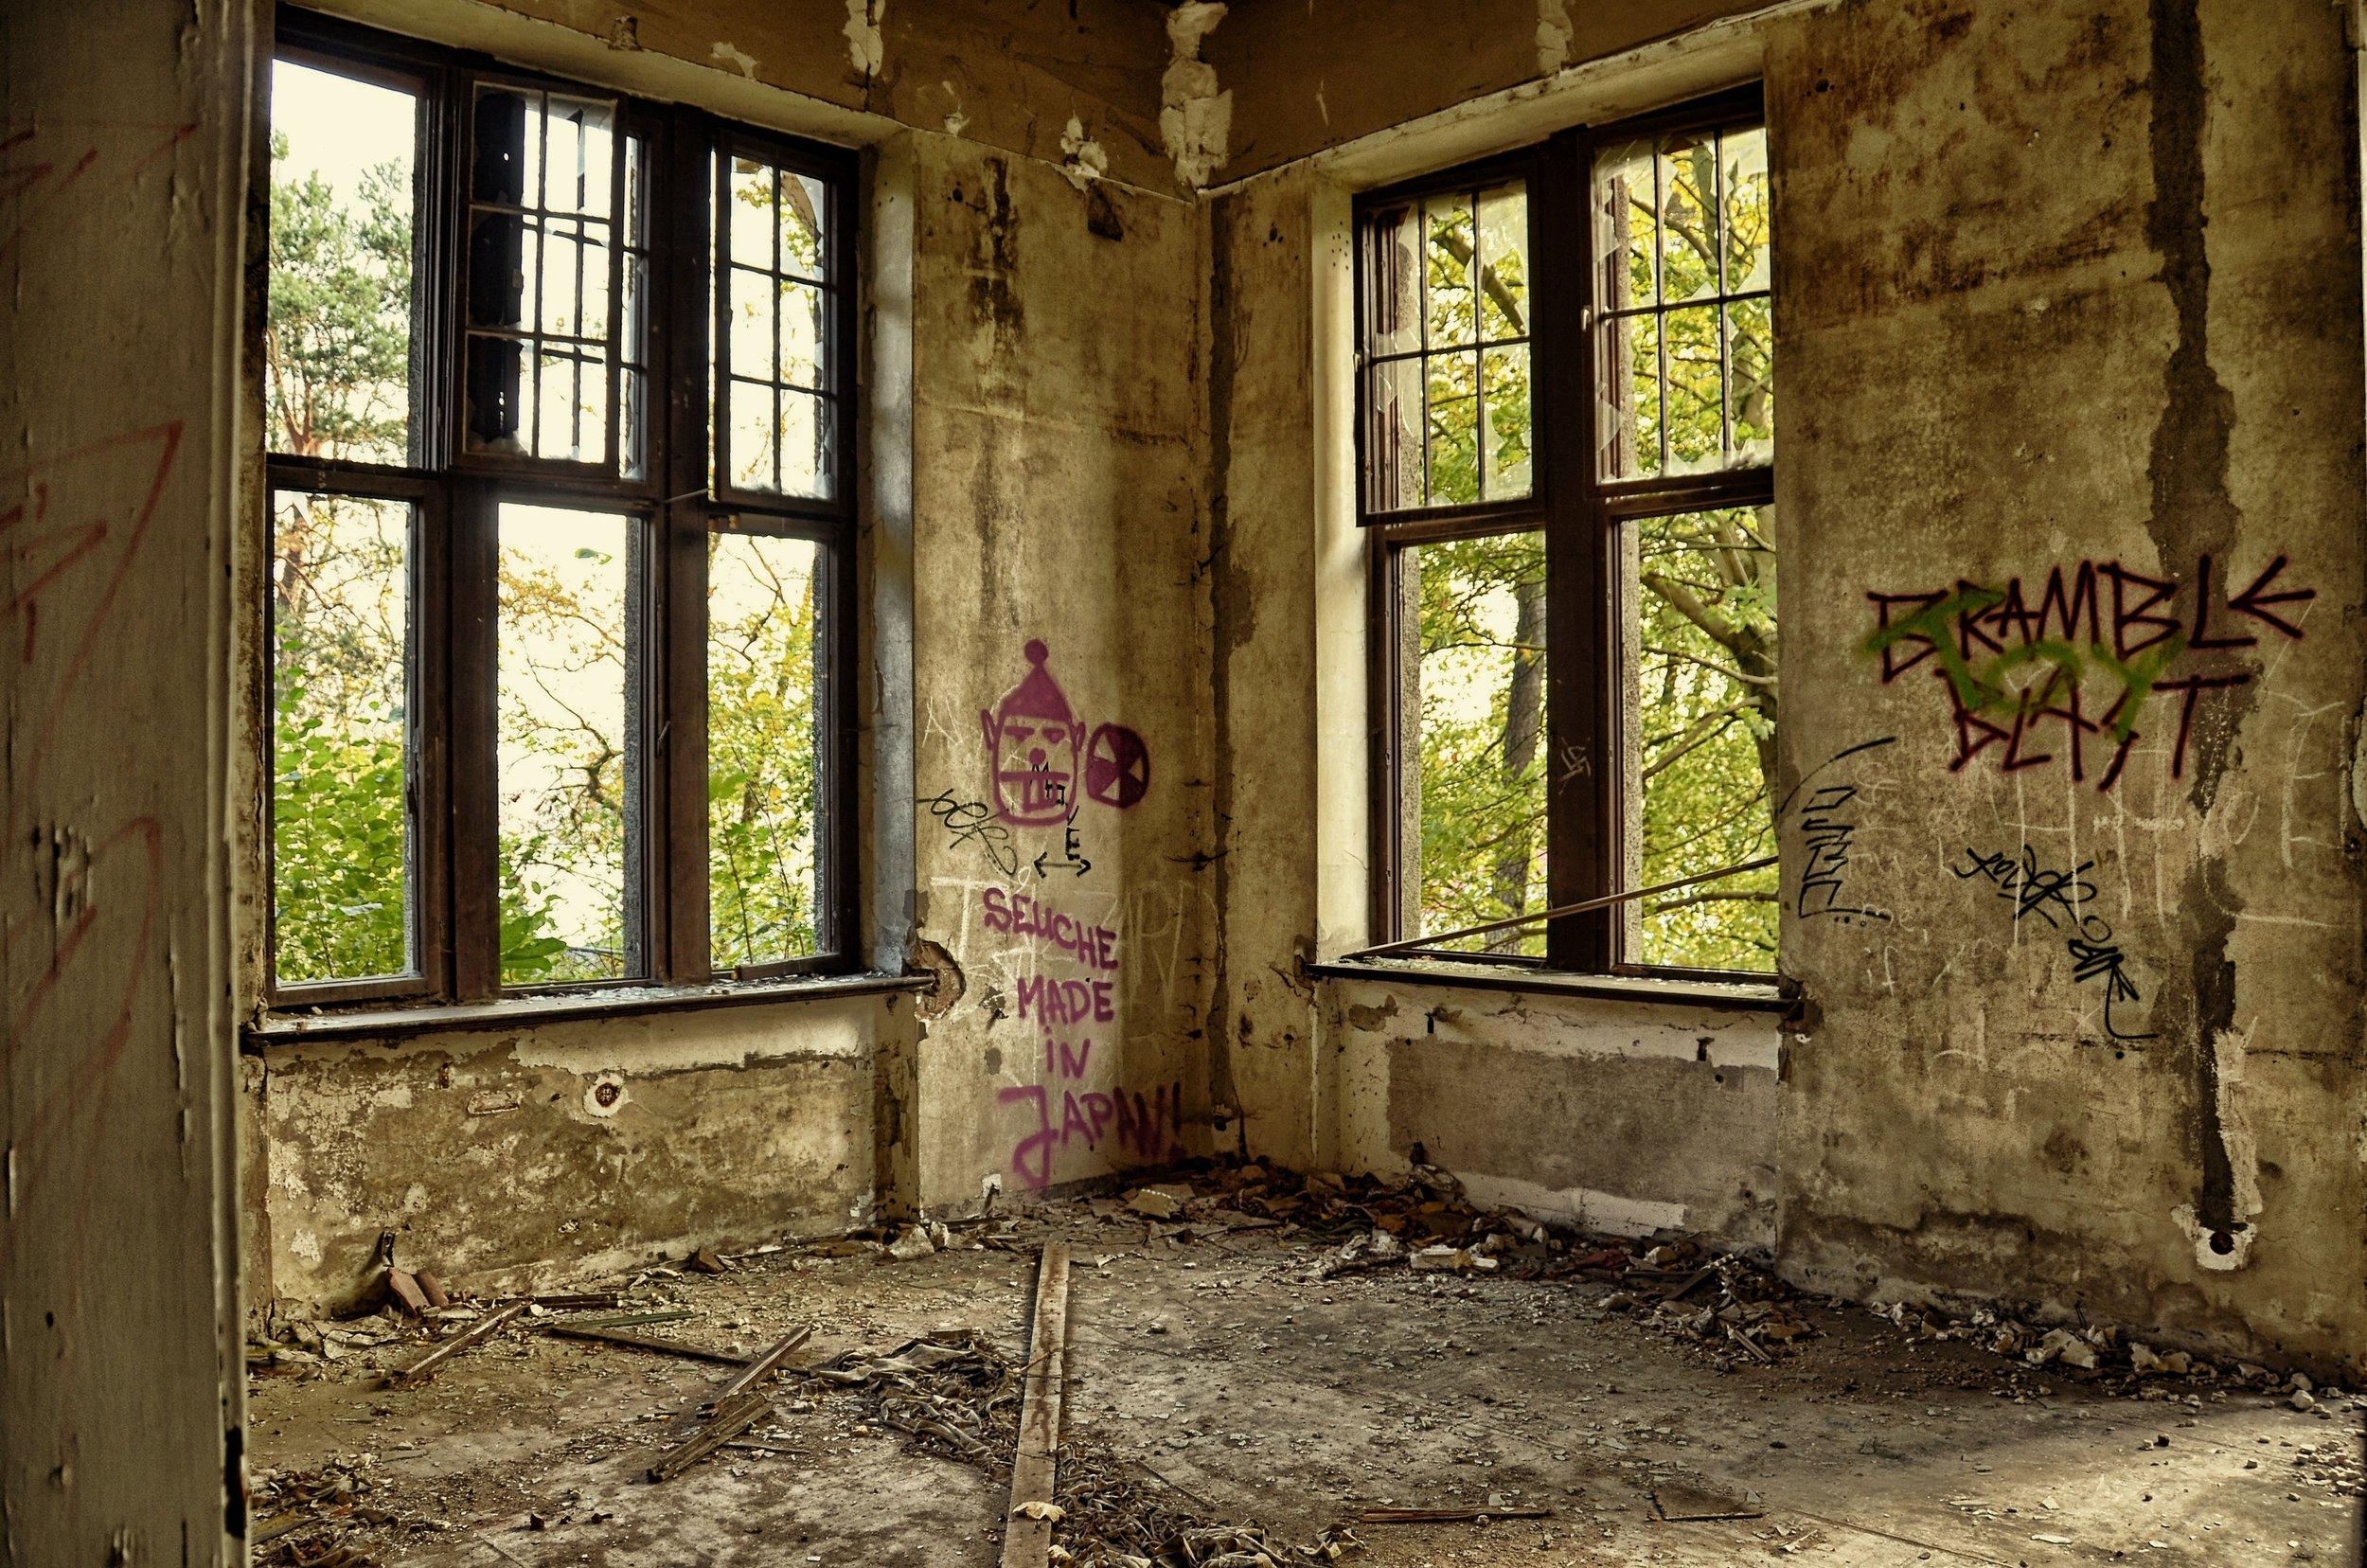 abandoned-building-dirty-164321.jpg